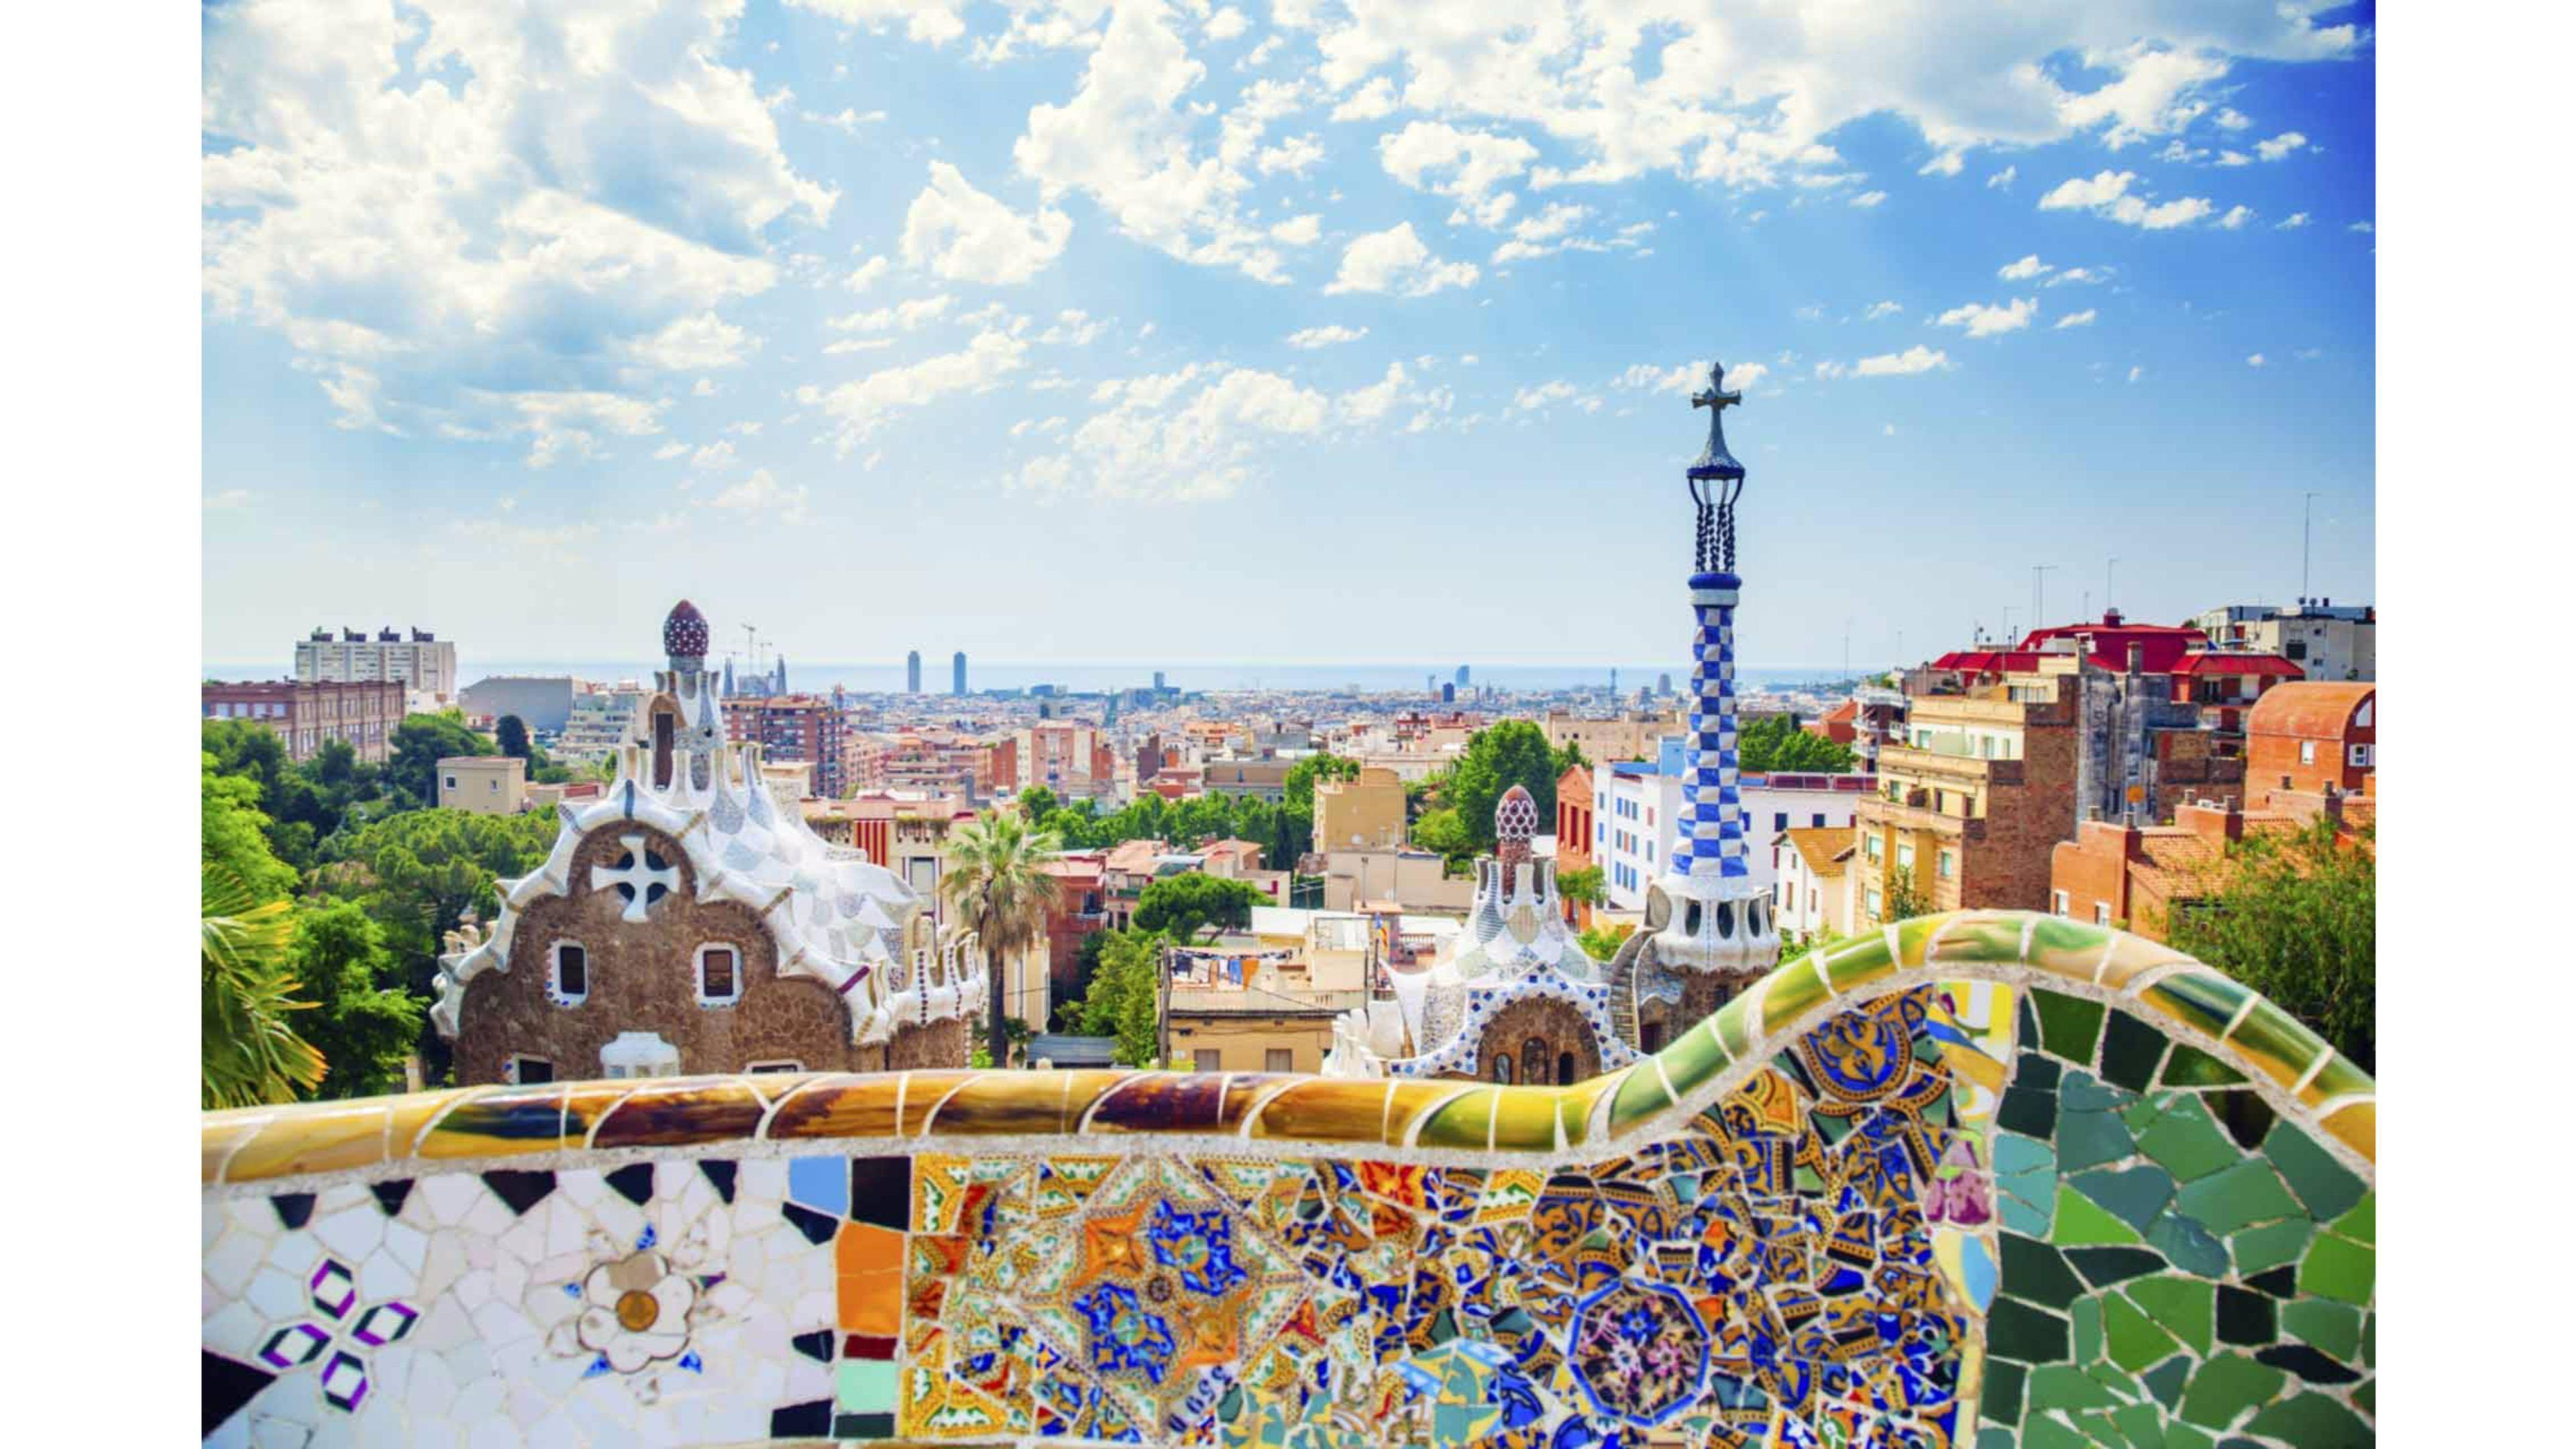 historical barcelona spain 4k - photo #4